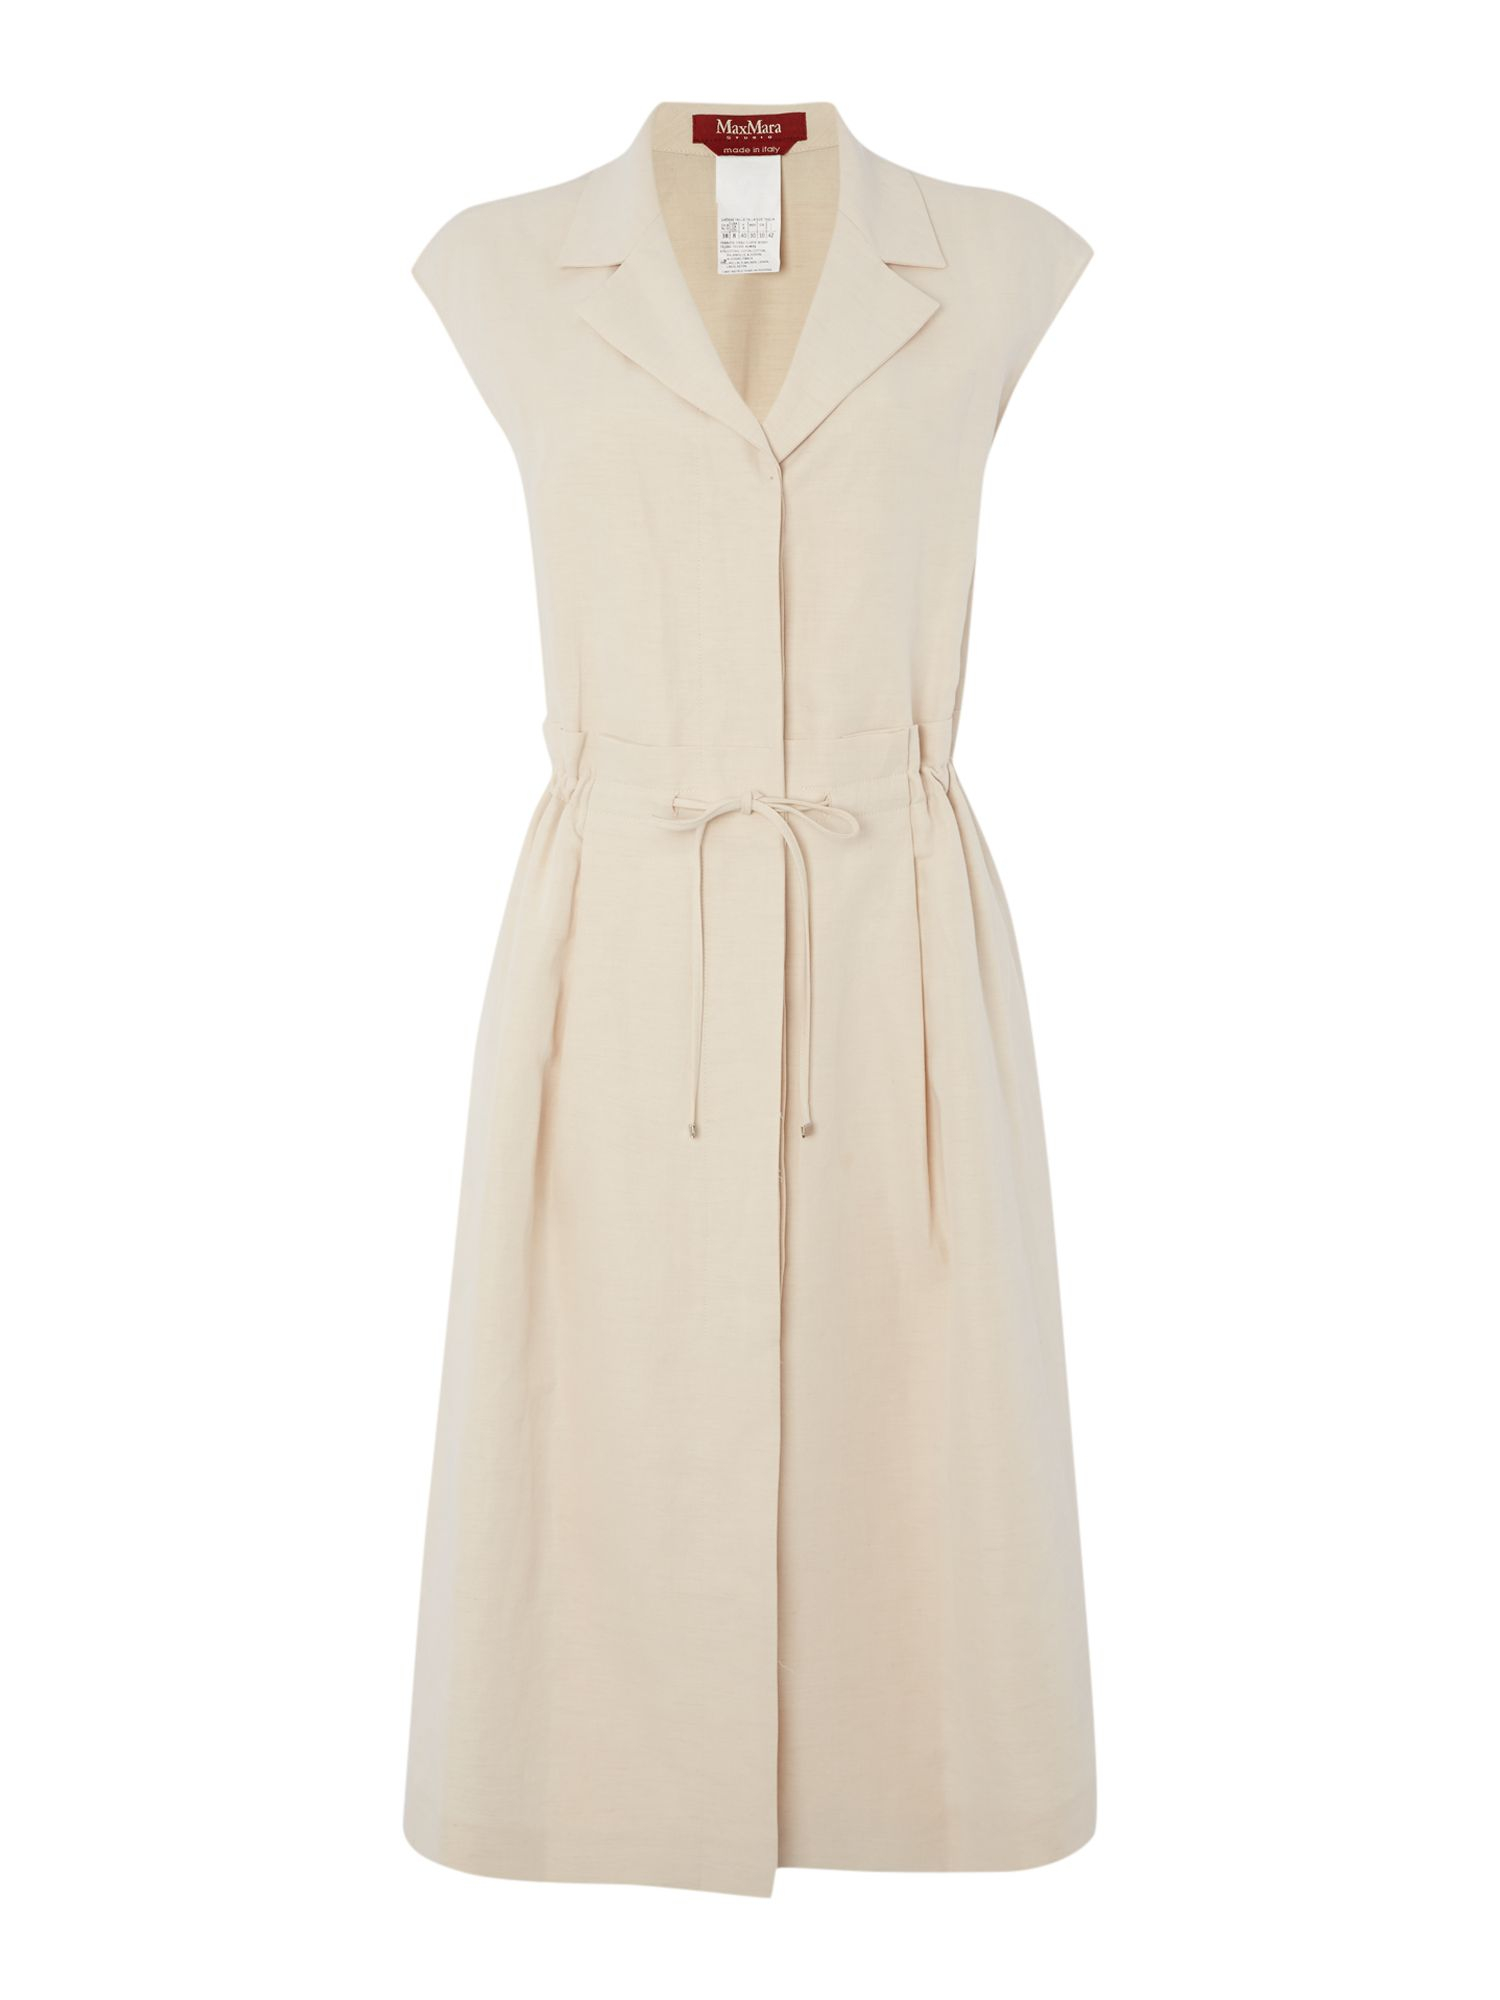 Max mara fabio linen shirt dress in white lyst for White linen dress shirt